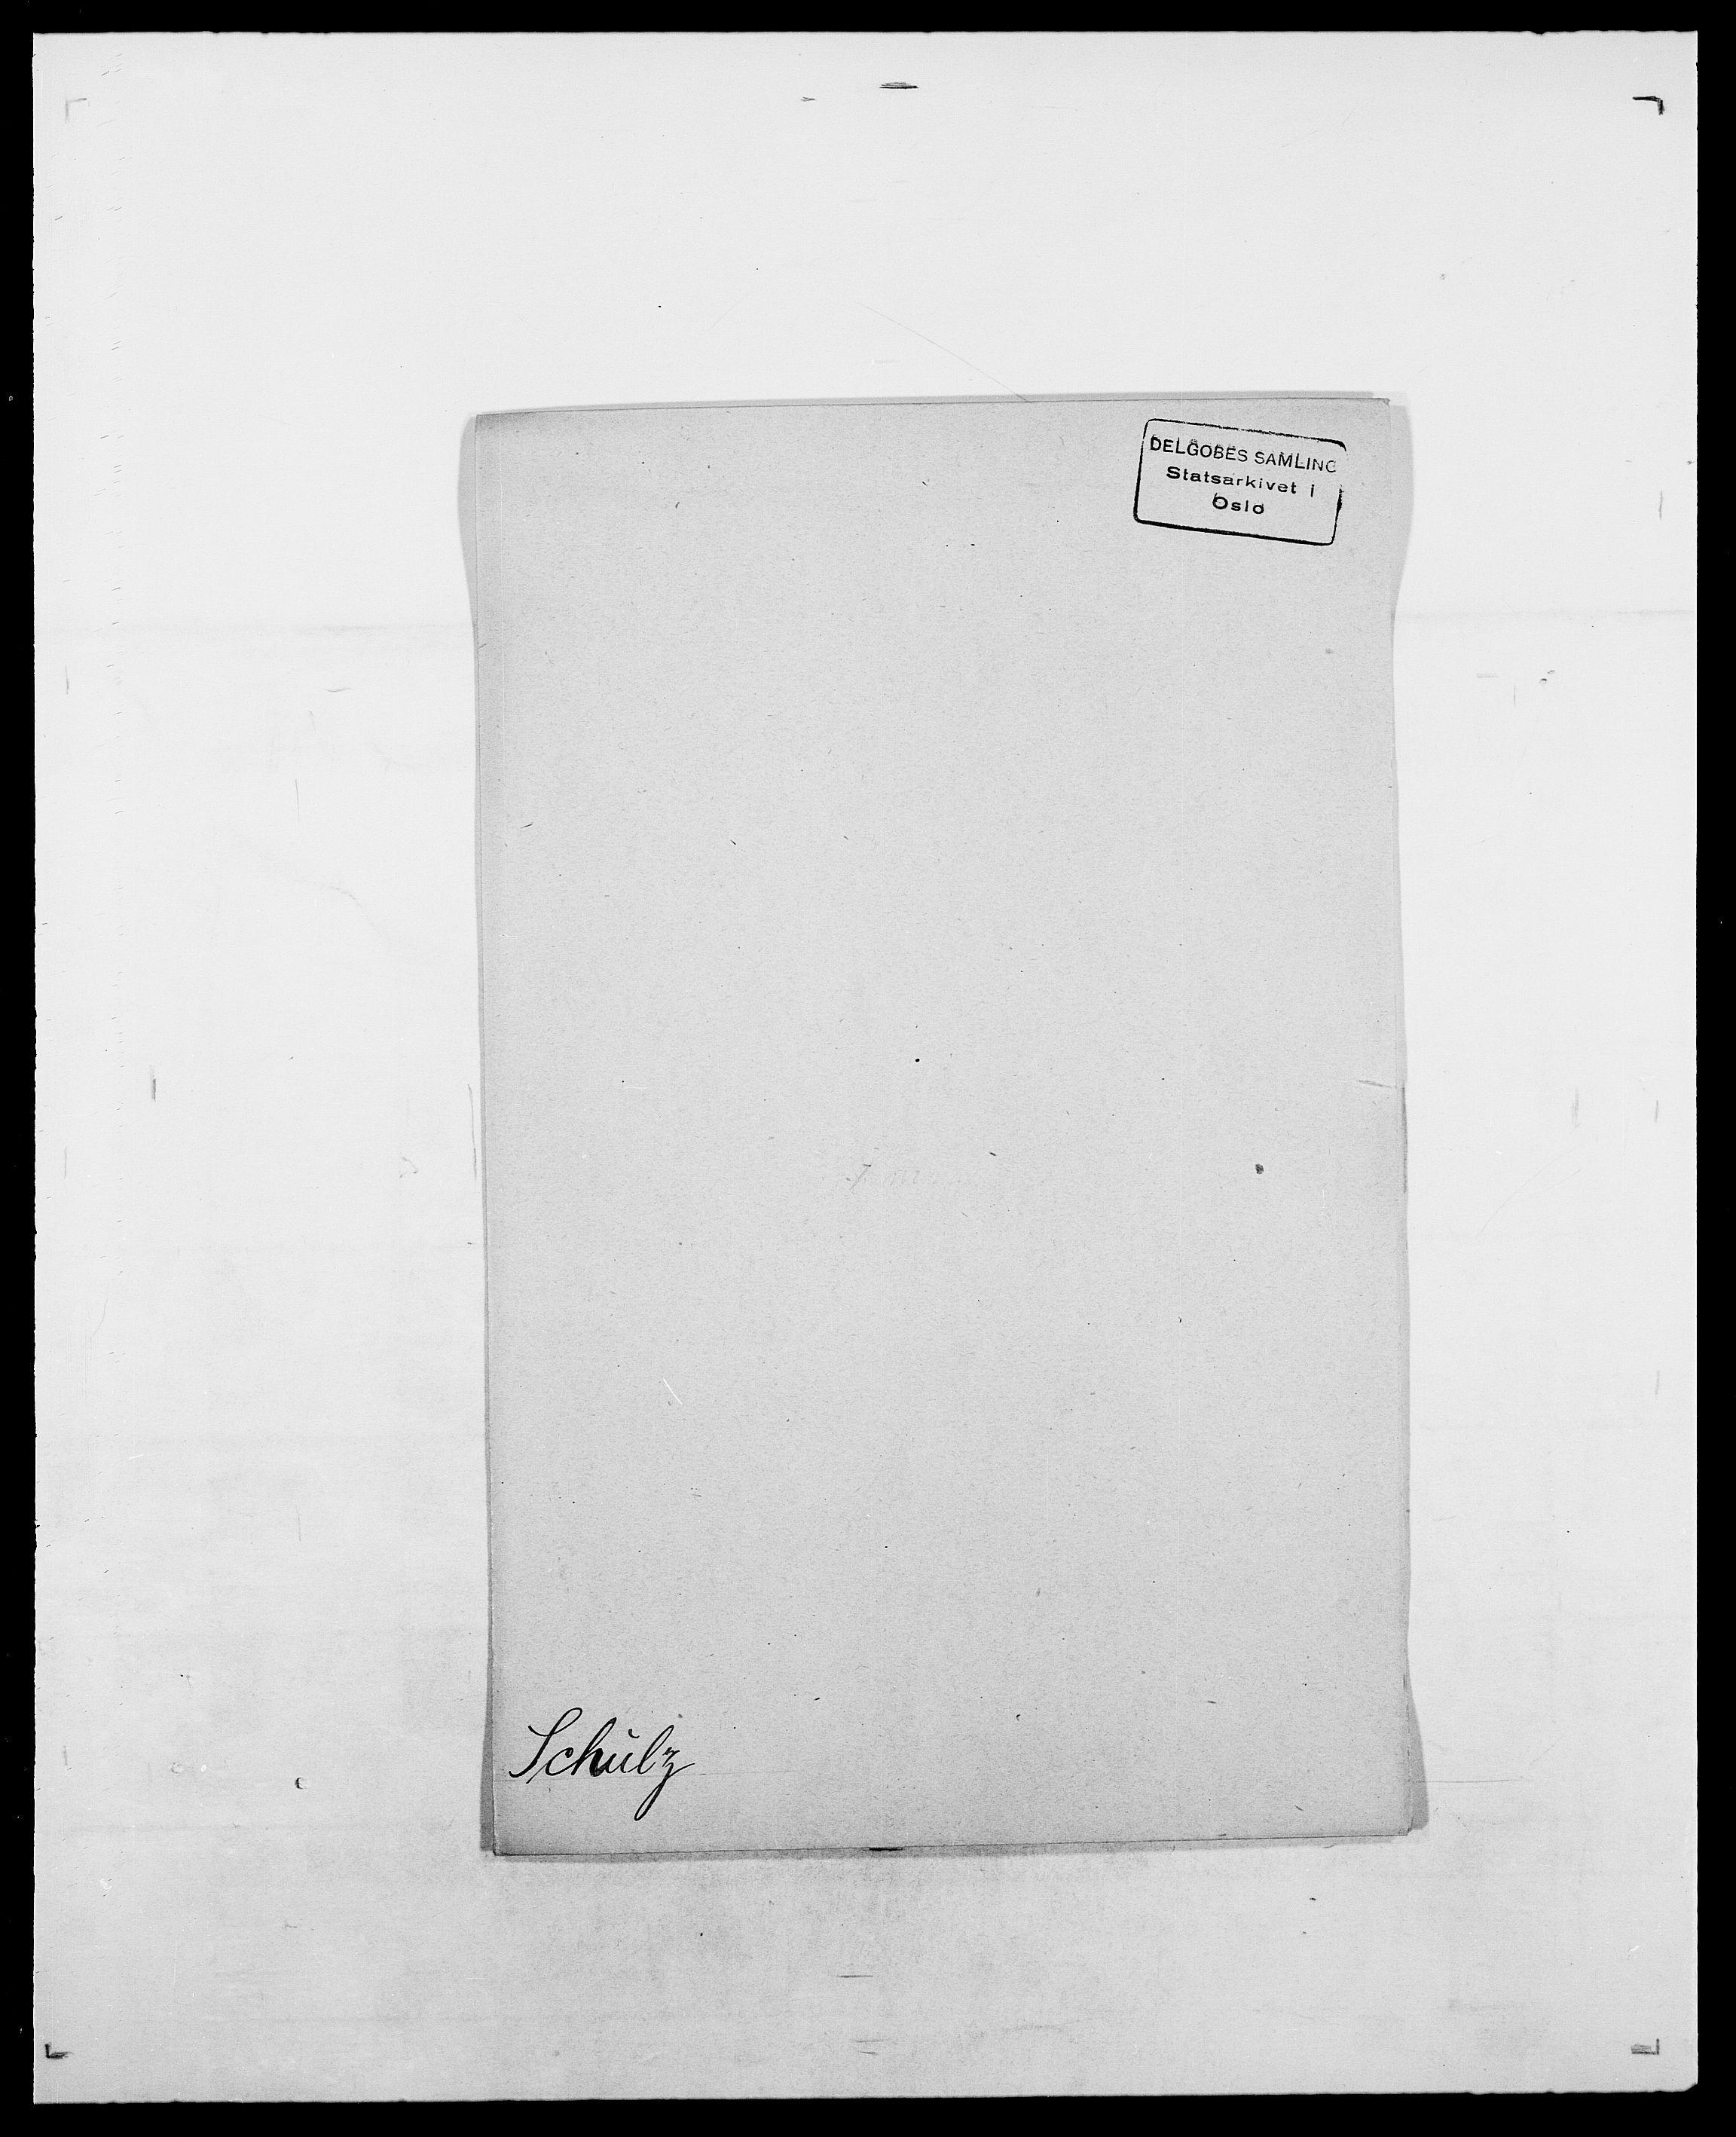 SAO, Delgobe, Charles Antoine - samling, D/Da/L0035: Schnabel - sjetman, s. 333